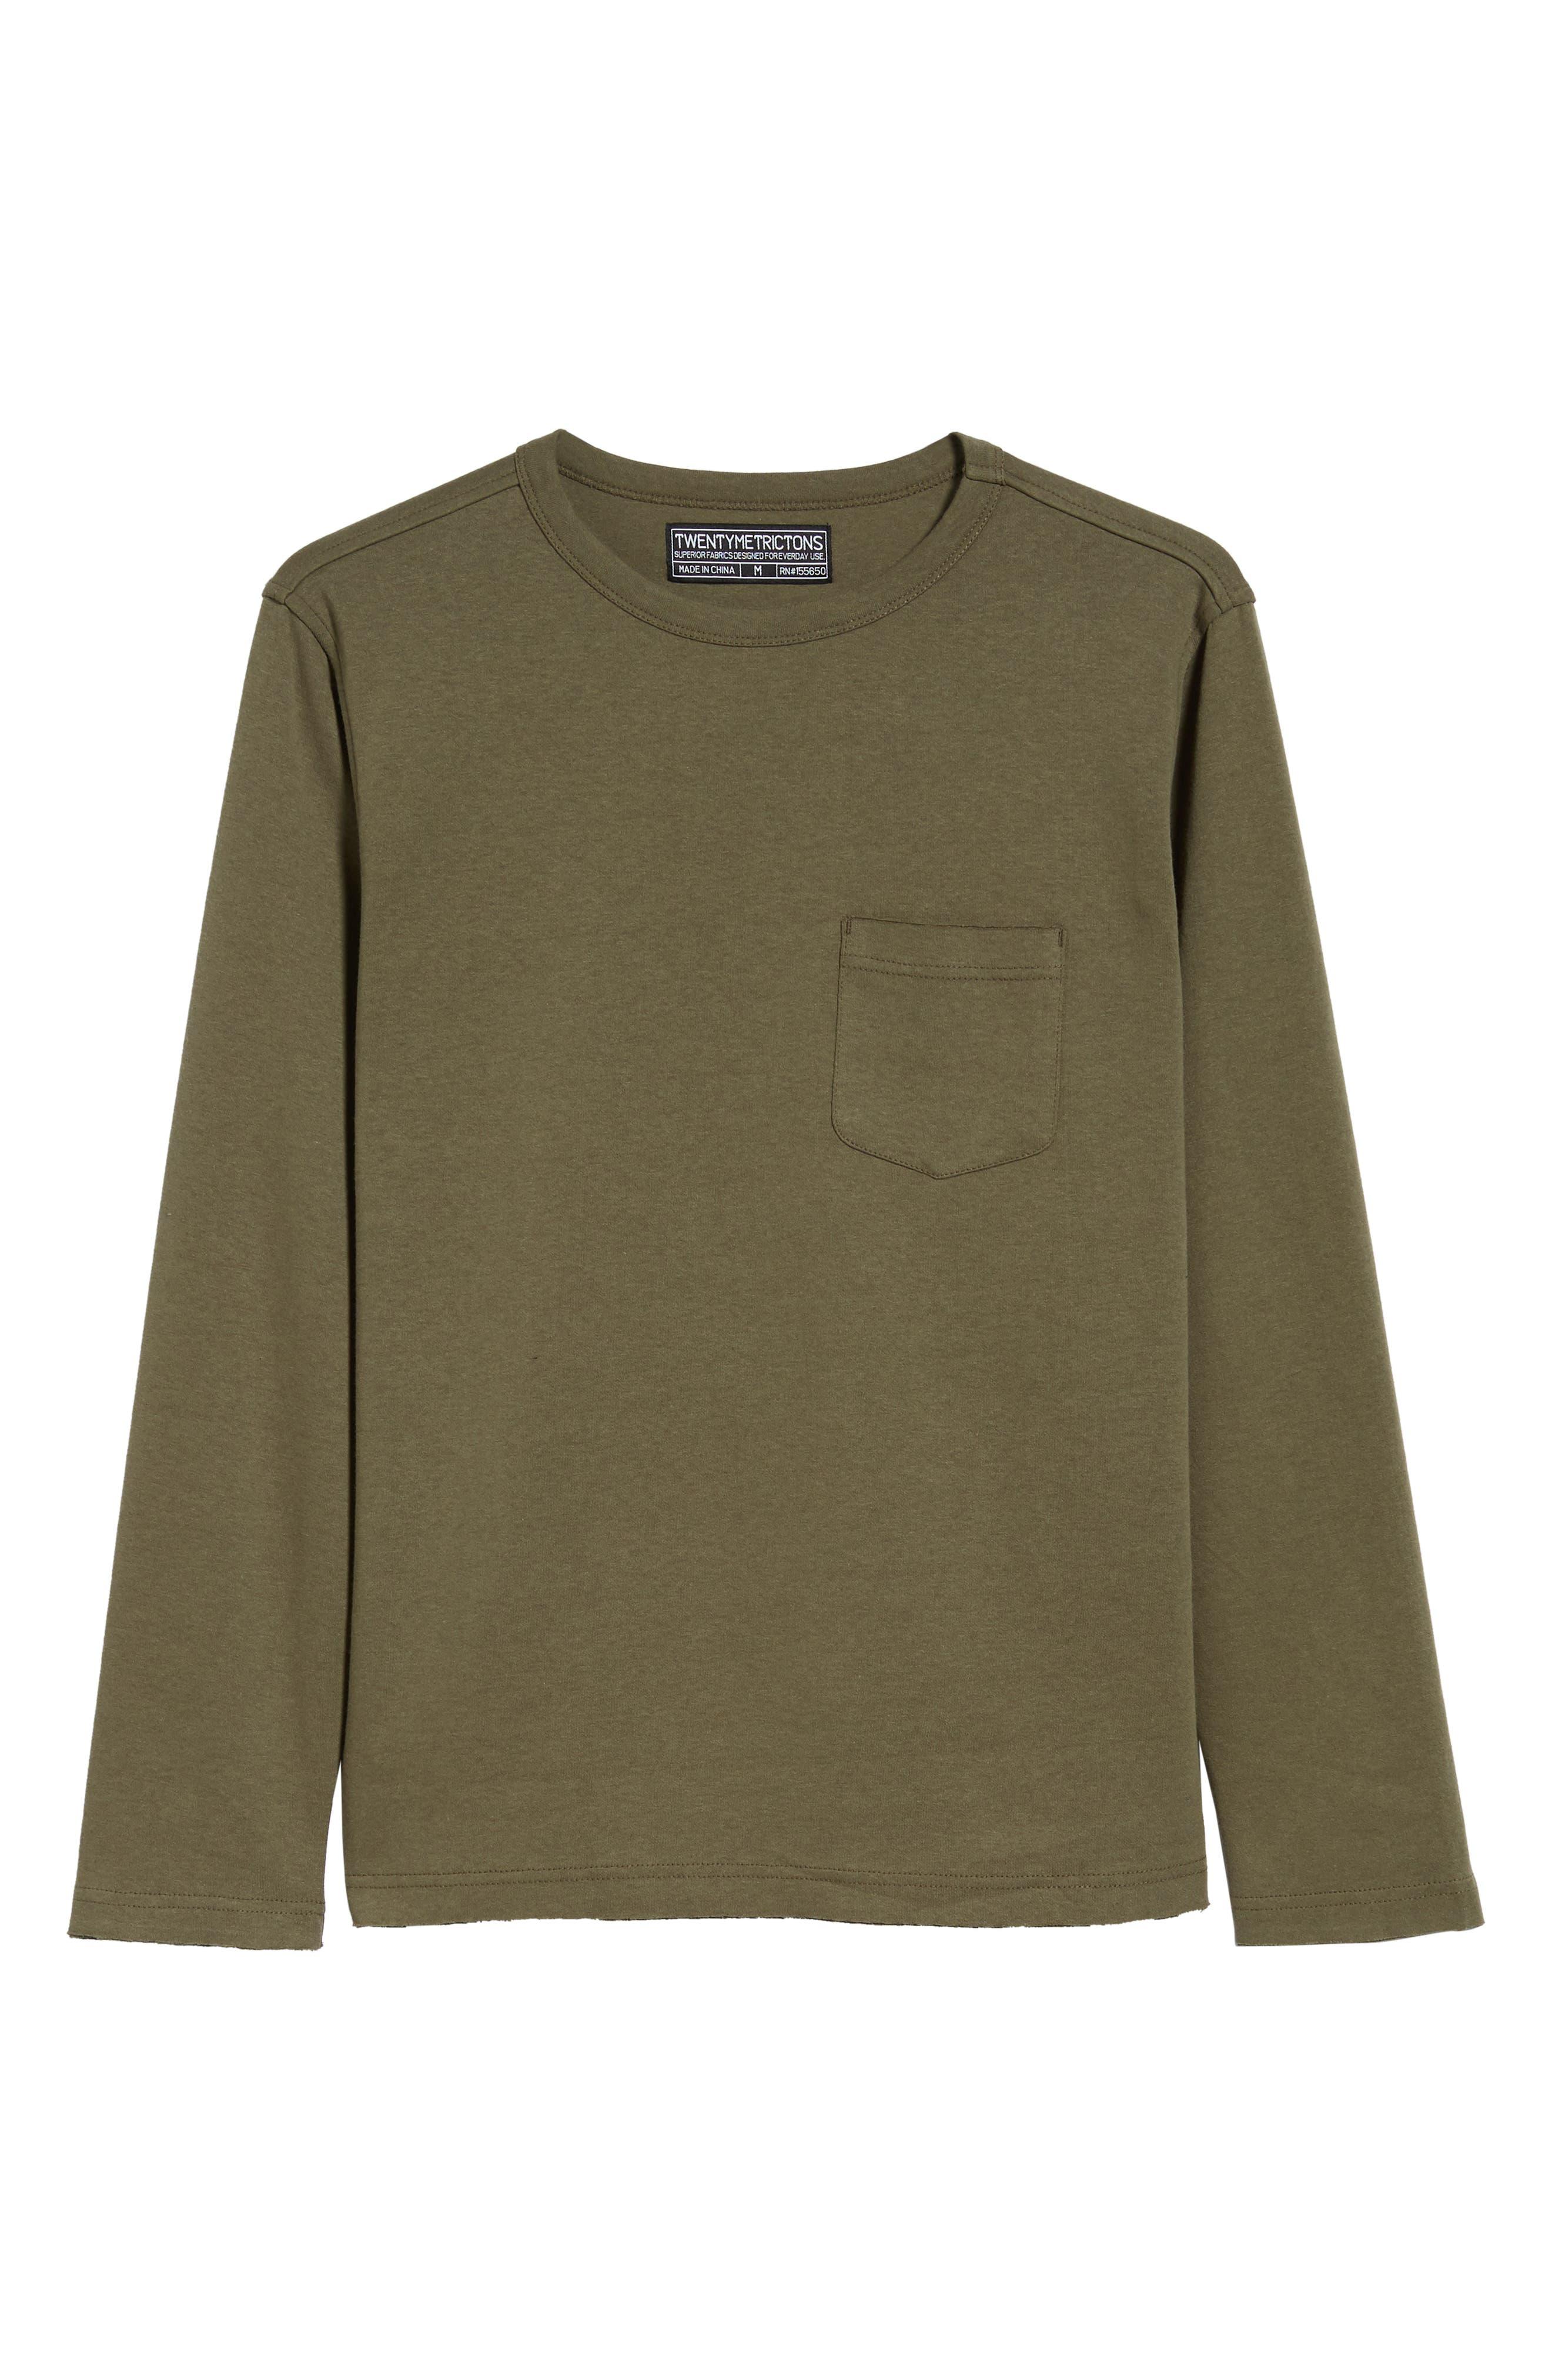 Trim Fit Long Sleeve Pocket T-Shirt,                             Alternate thumbnail 6, color,                             OLIVE